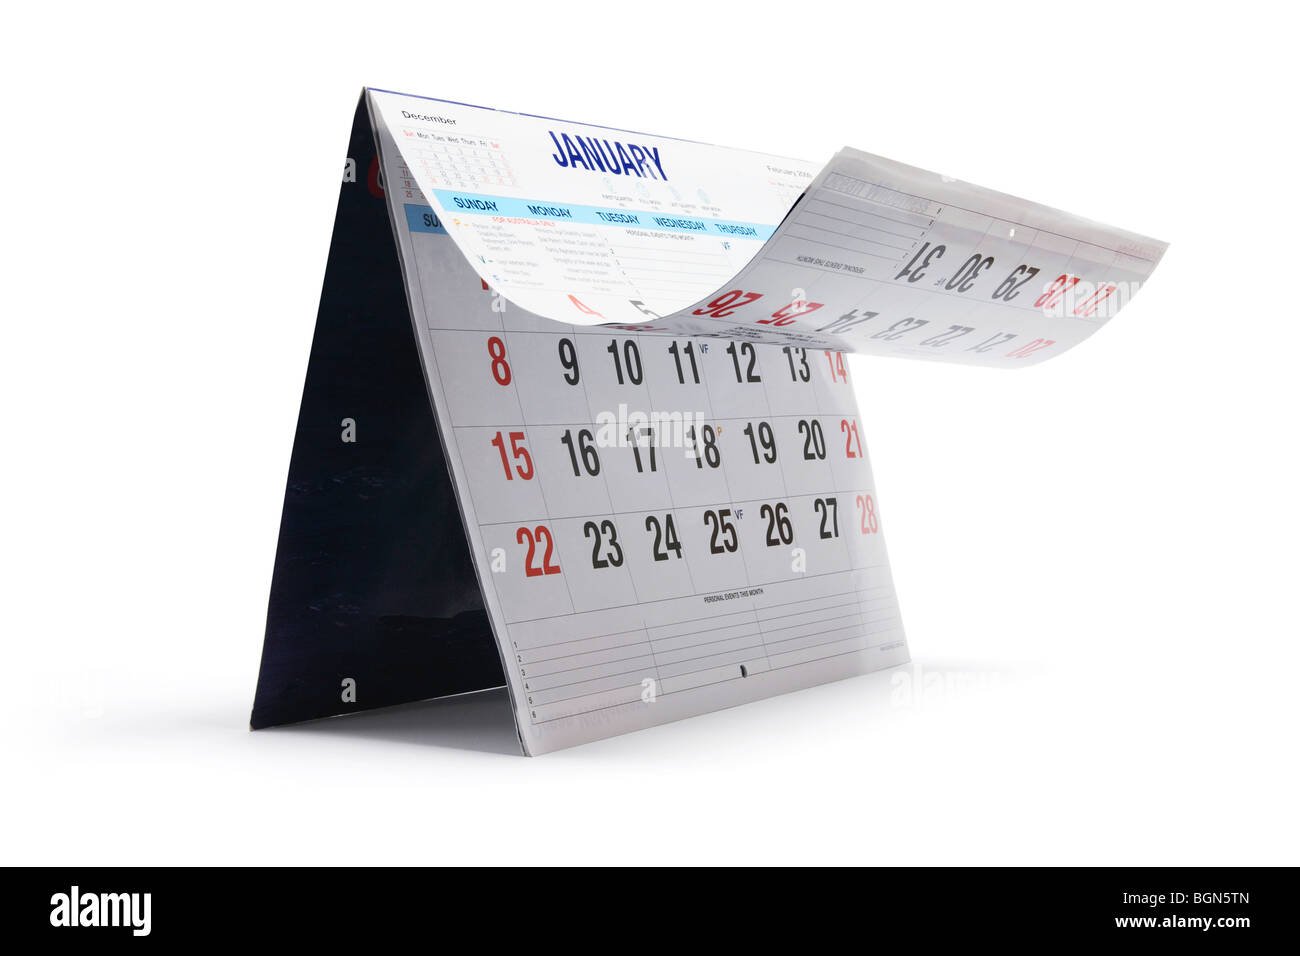 Calendar - Stock Image